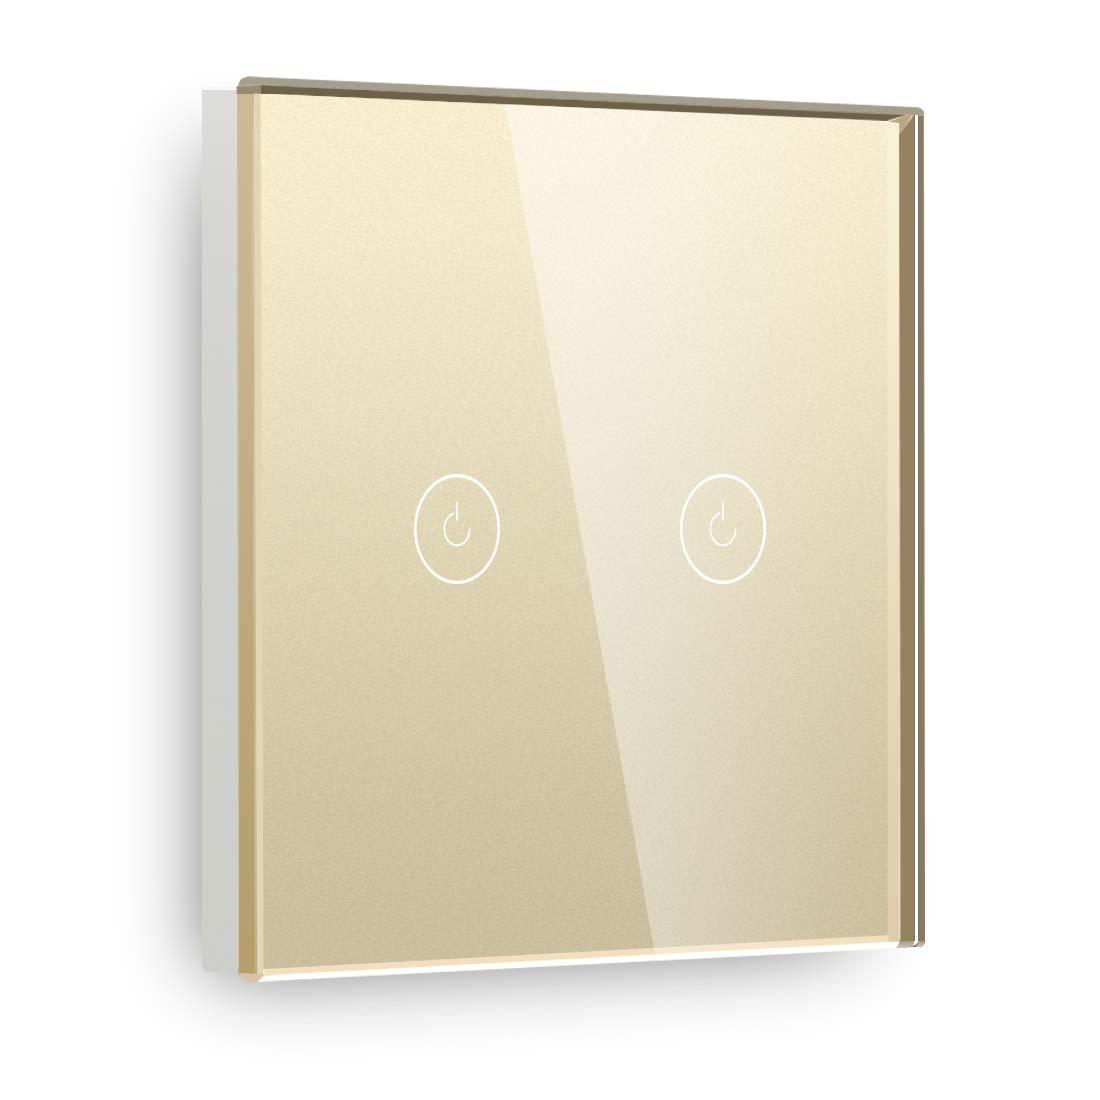 BSEED Interruptor de pared t/áctil de 86 mm Panel de vidrio InterruptorTemplado inteligentes 1 Gang 1 Way 110V 250V Blanco